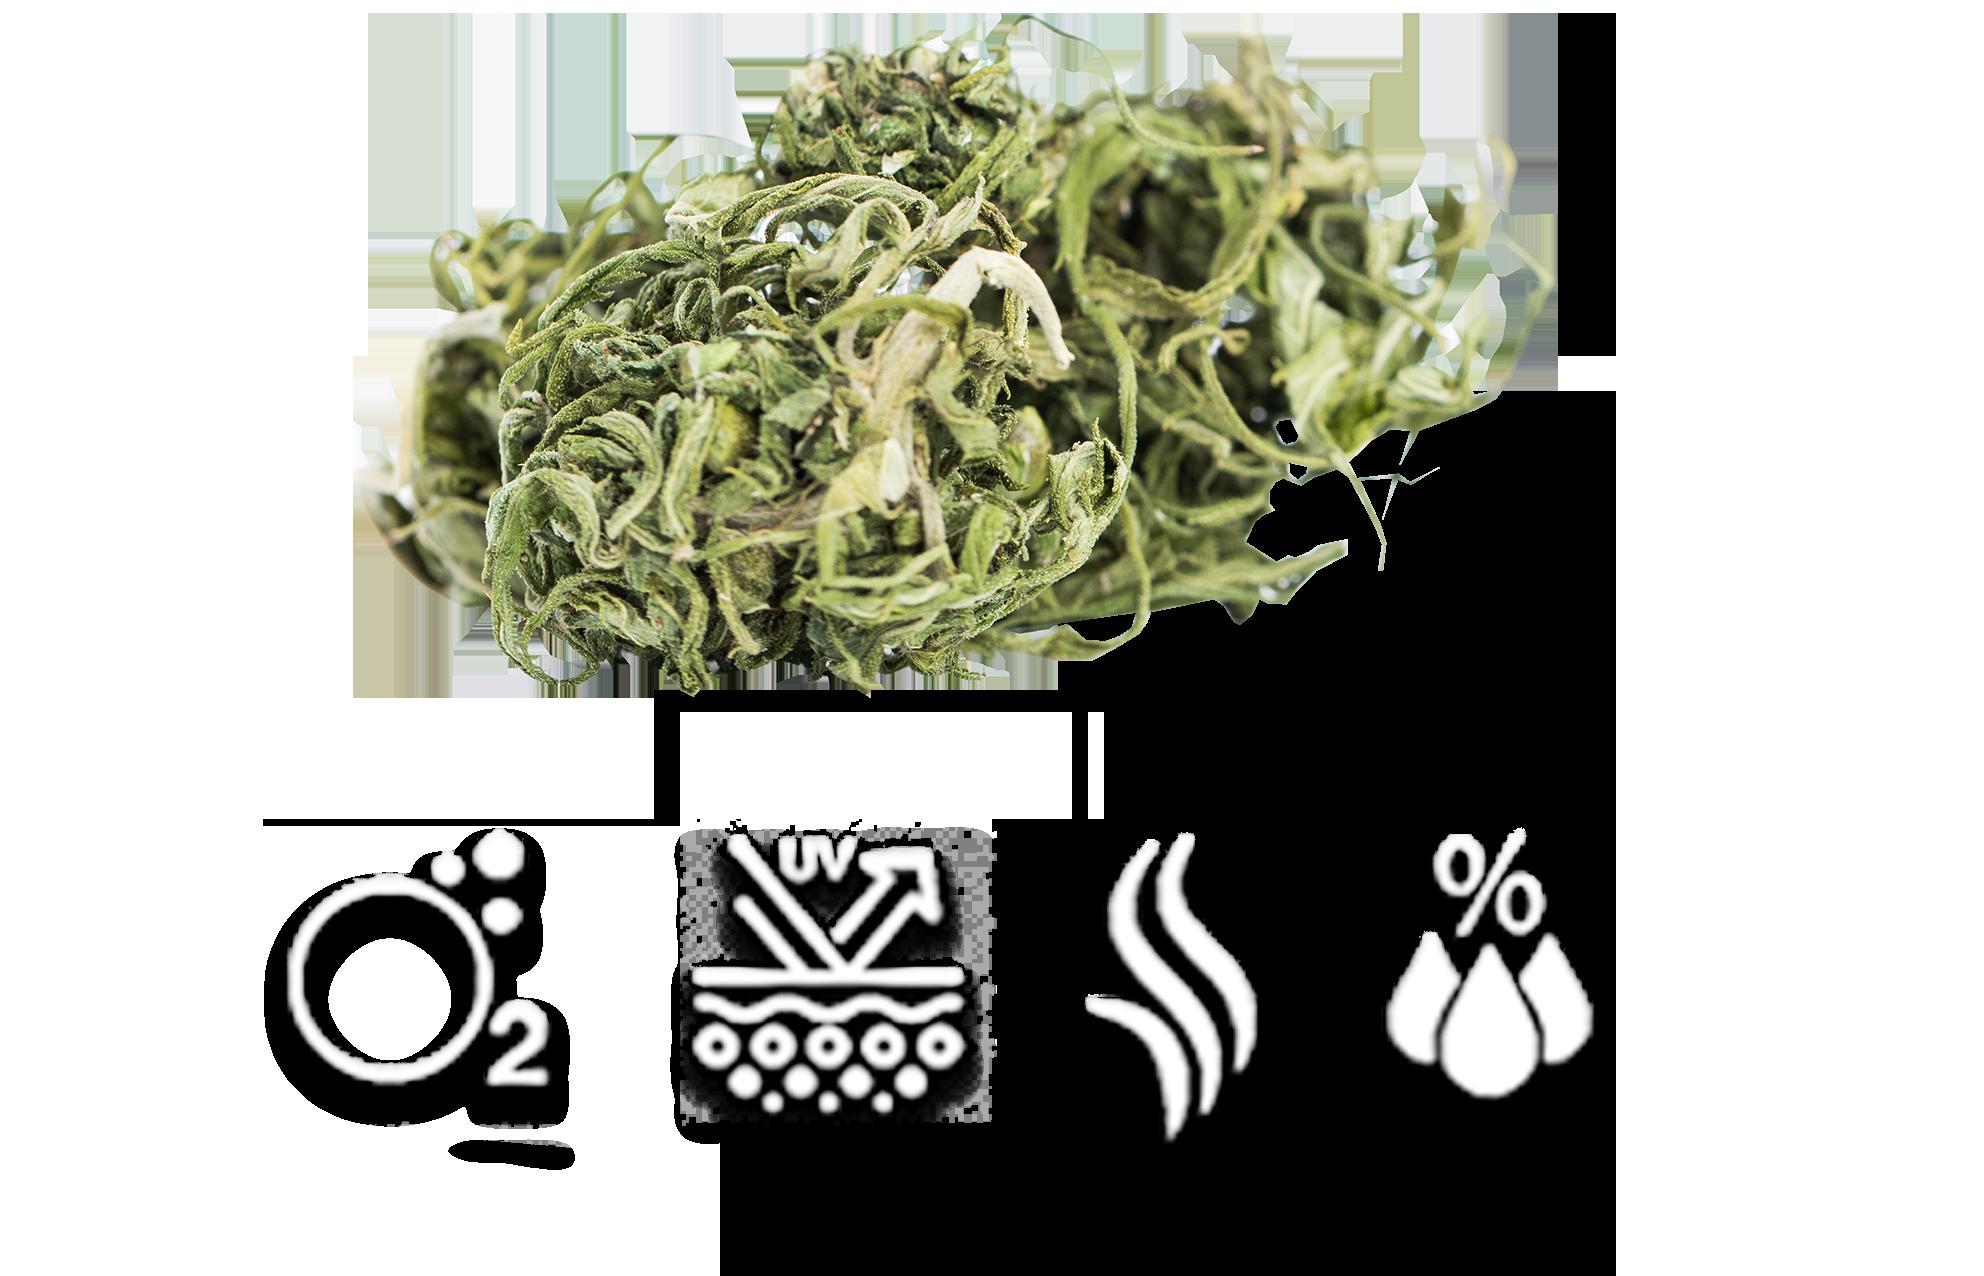 vQm - Hemp / Cannabis